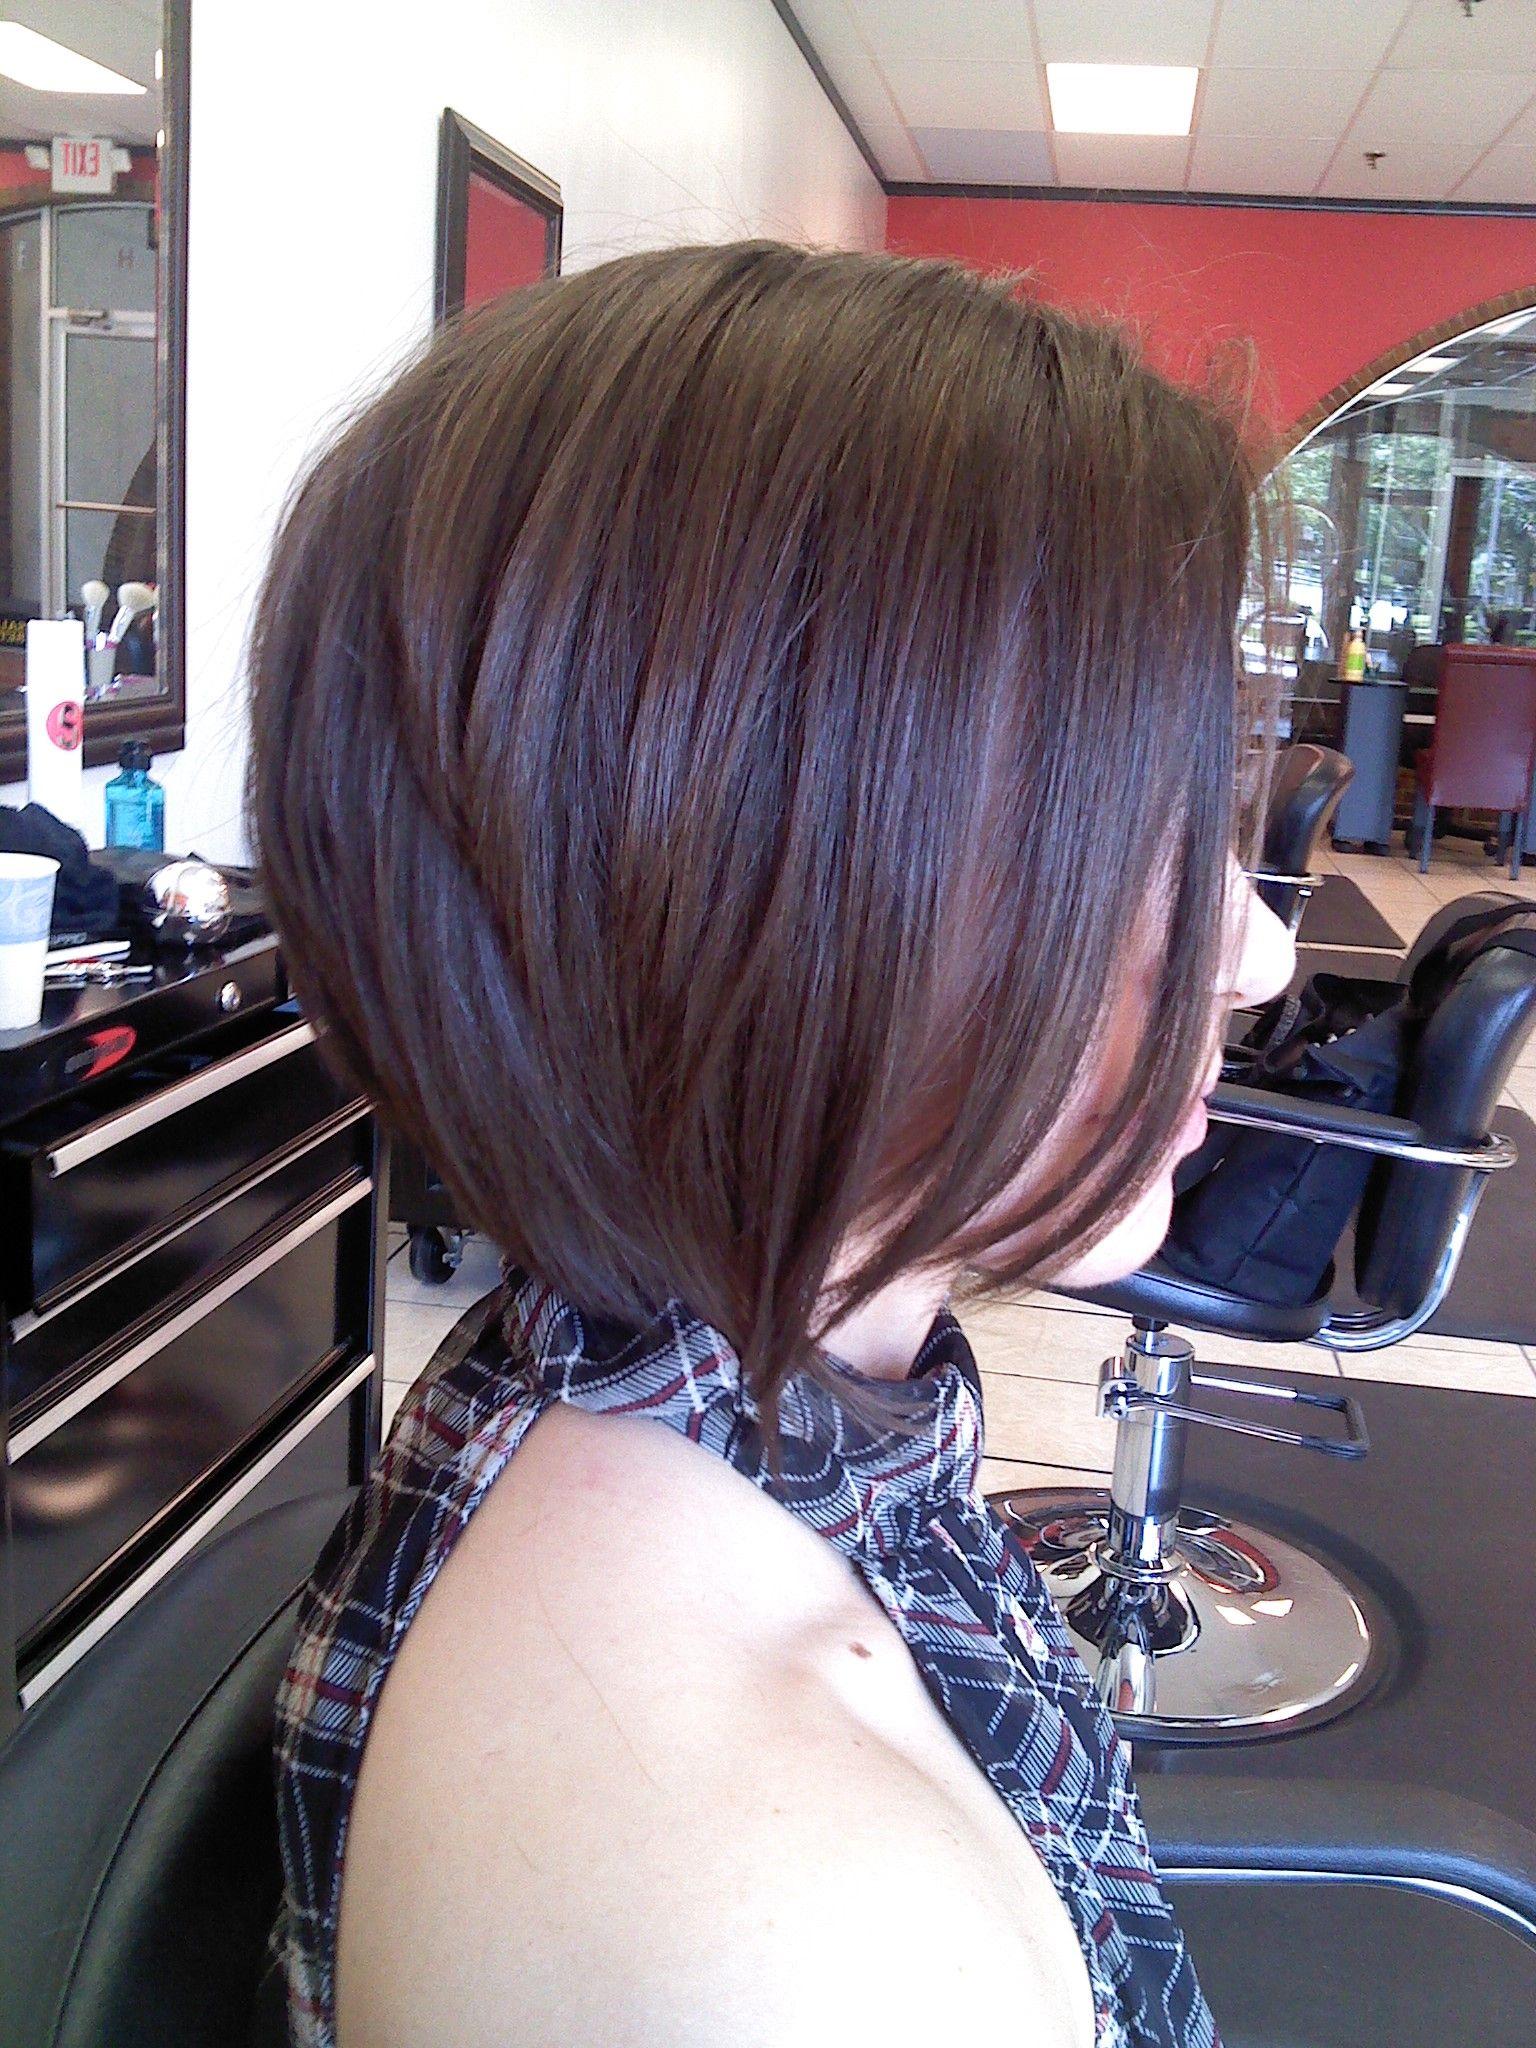 Short hair cut slightly aline medium length layers in the back